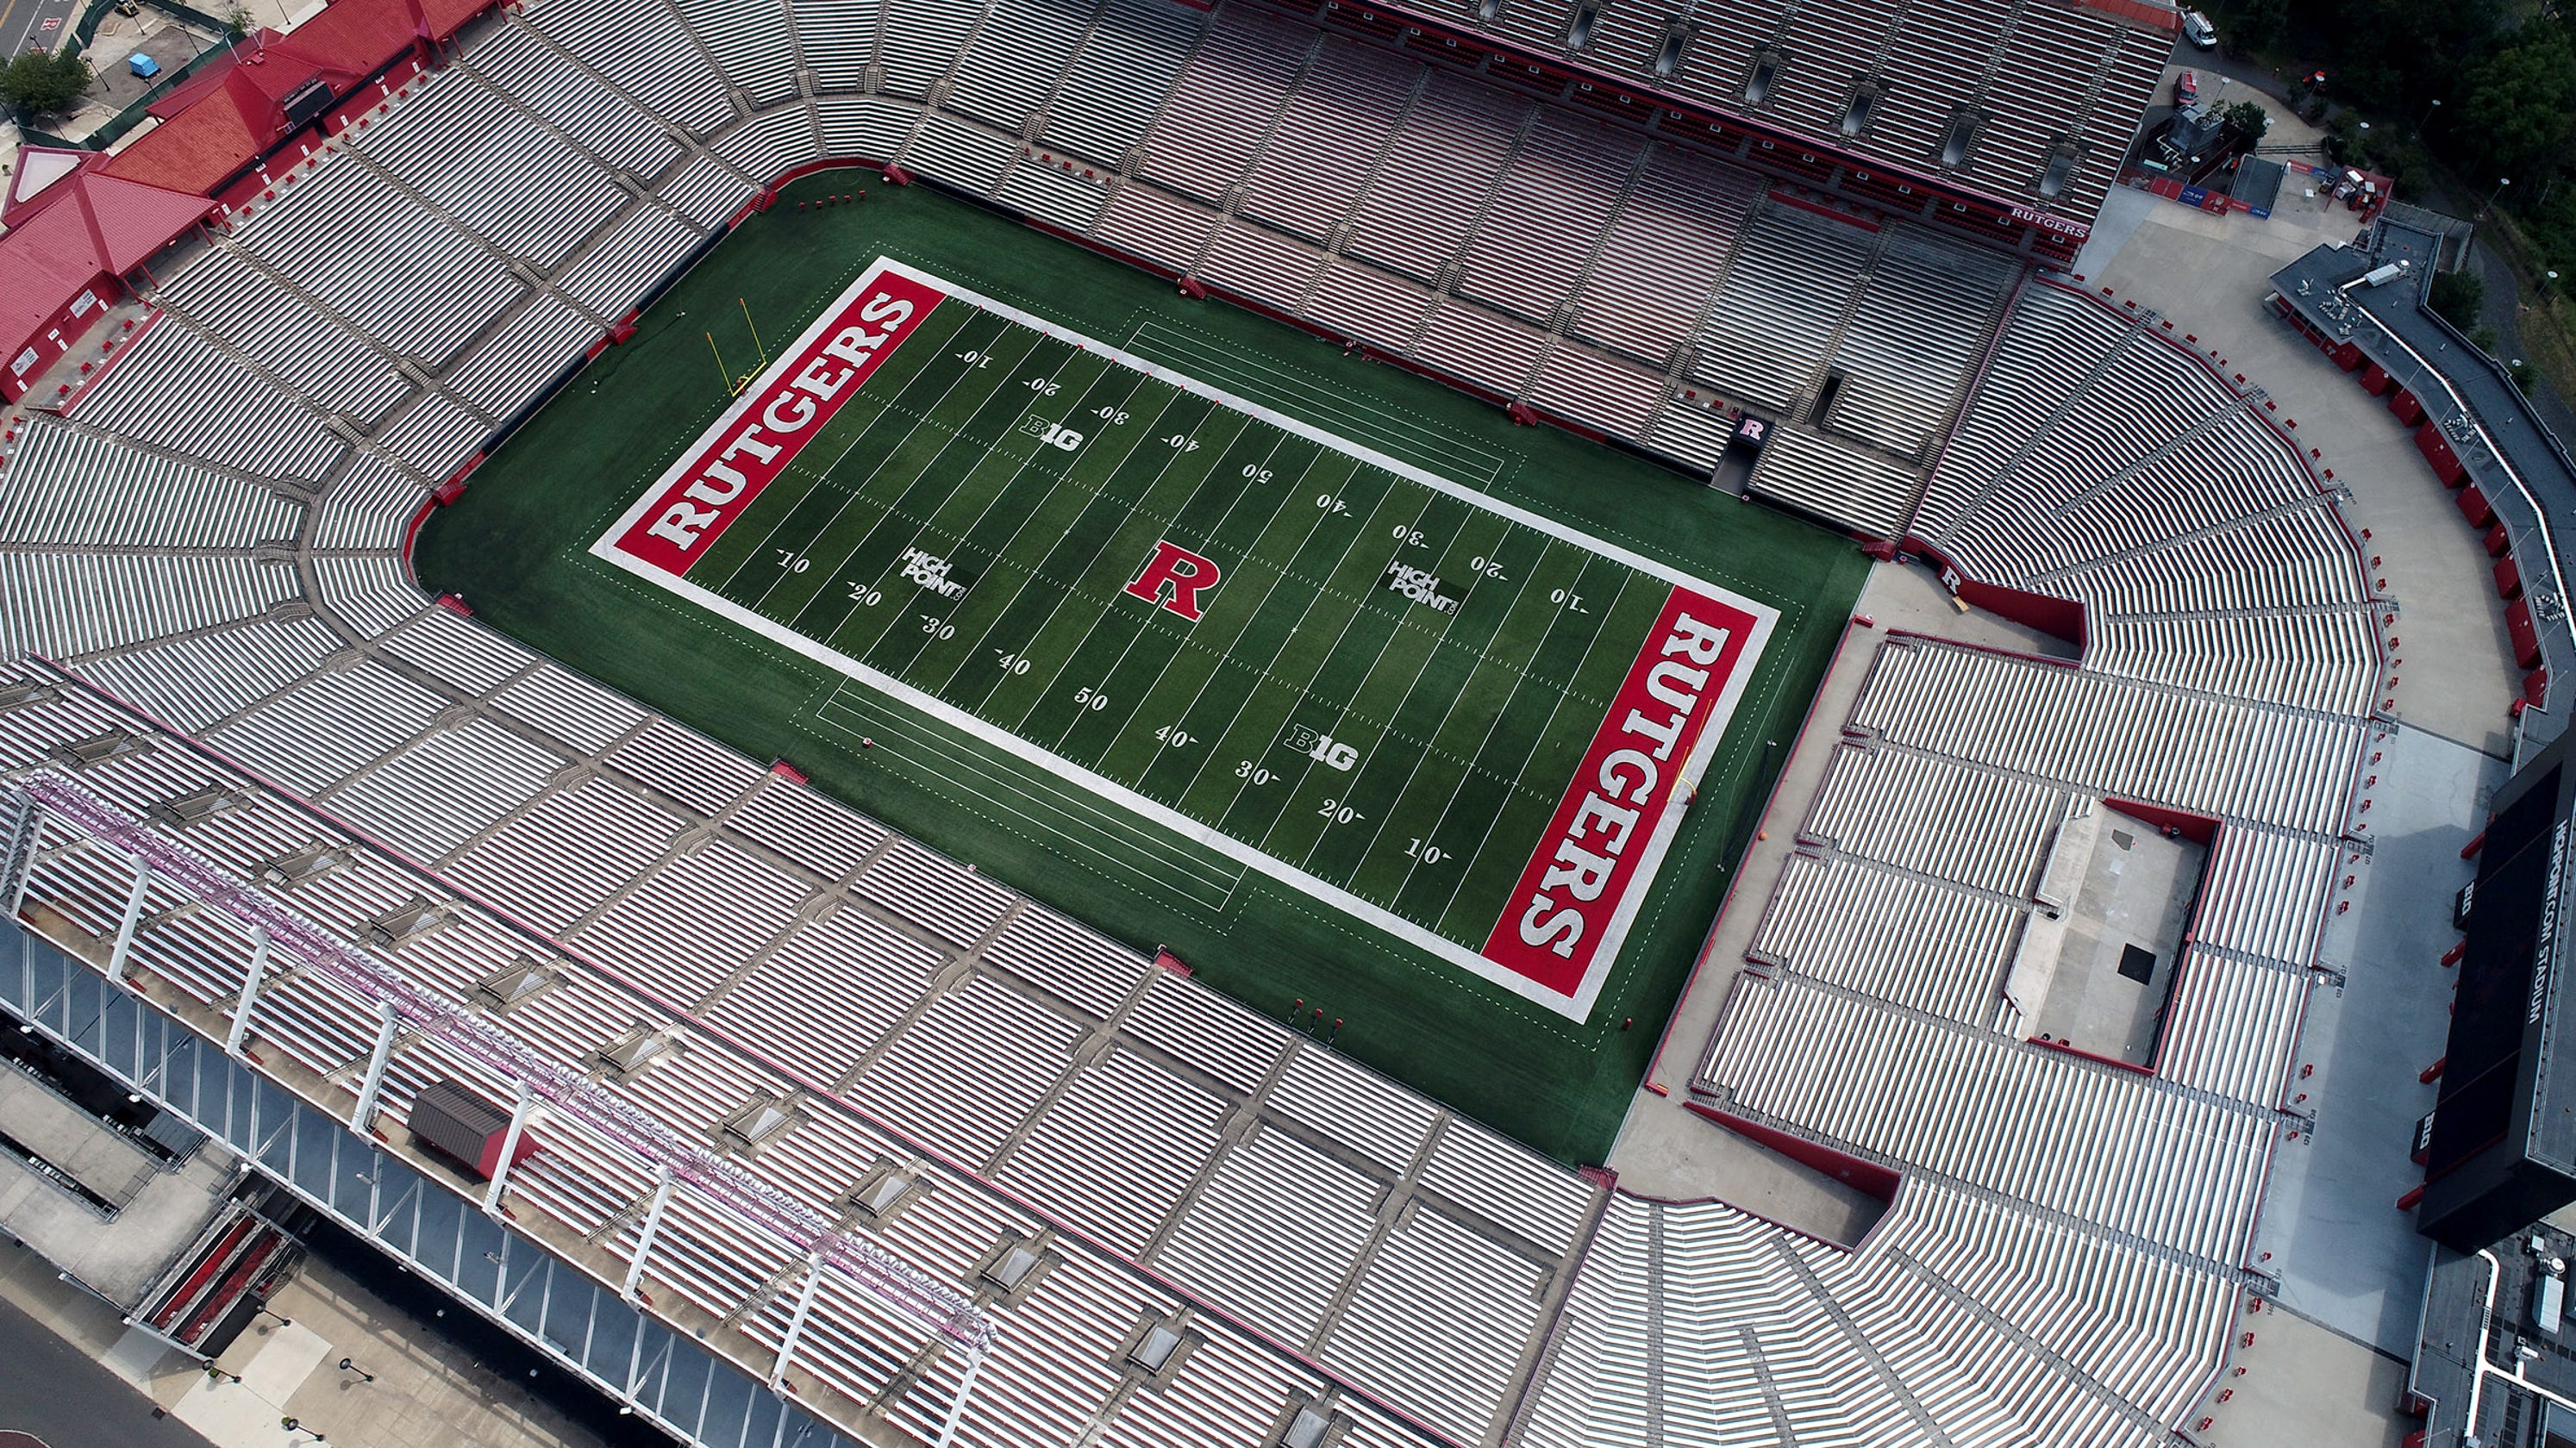 Rutgers football: Jarrett Paul debuts at free safety as